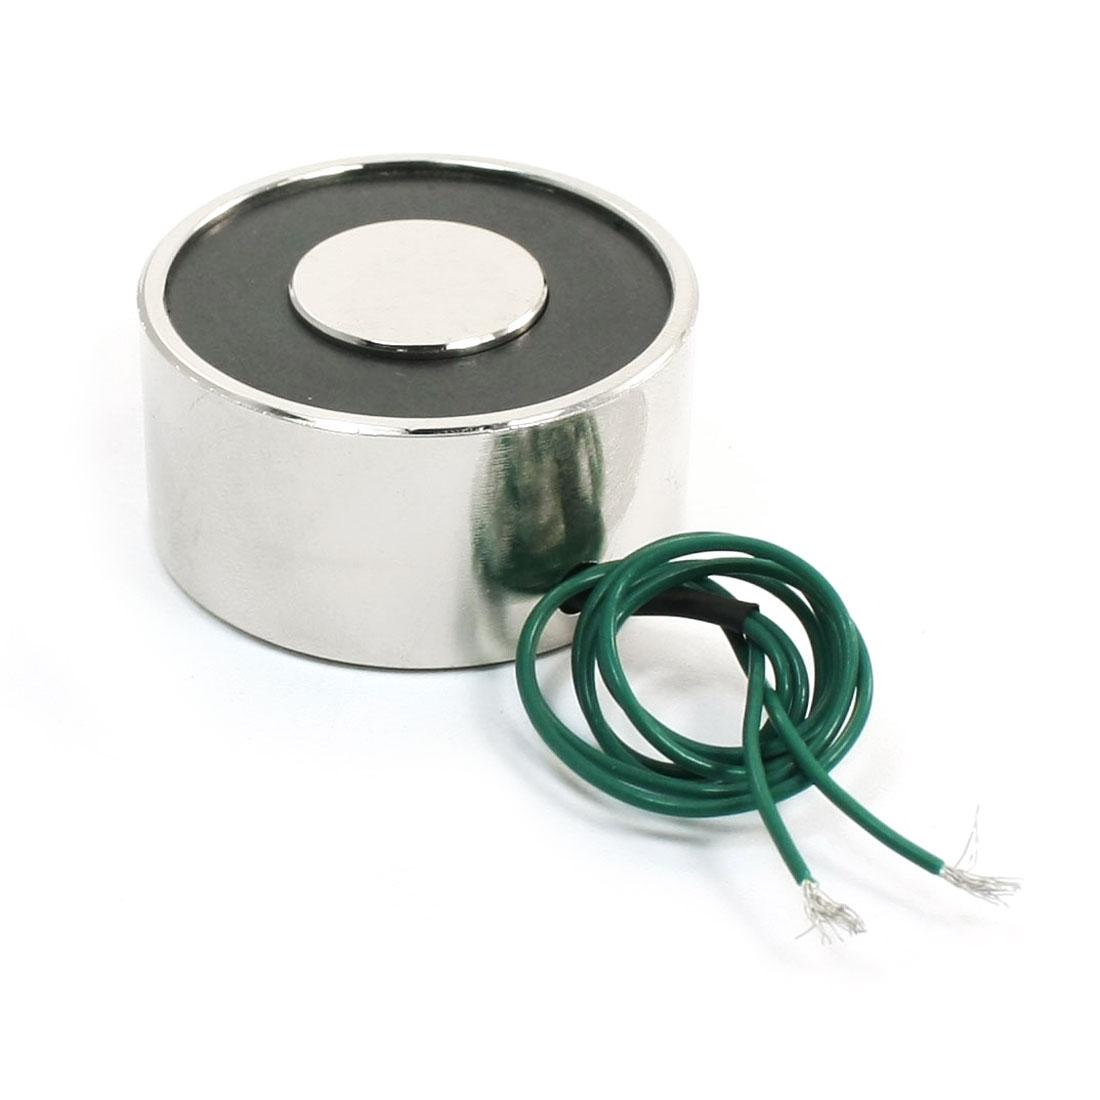 Uxcell 12V 55LB 25Kg Electric Lifting Magnet Electromagnet Solenoid Lift Holding 40mm